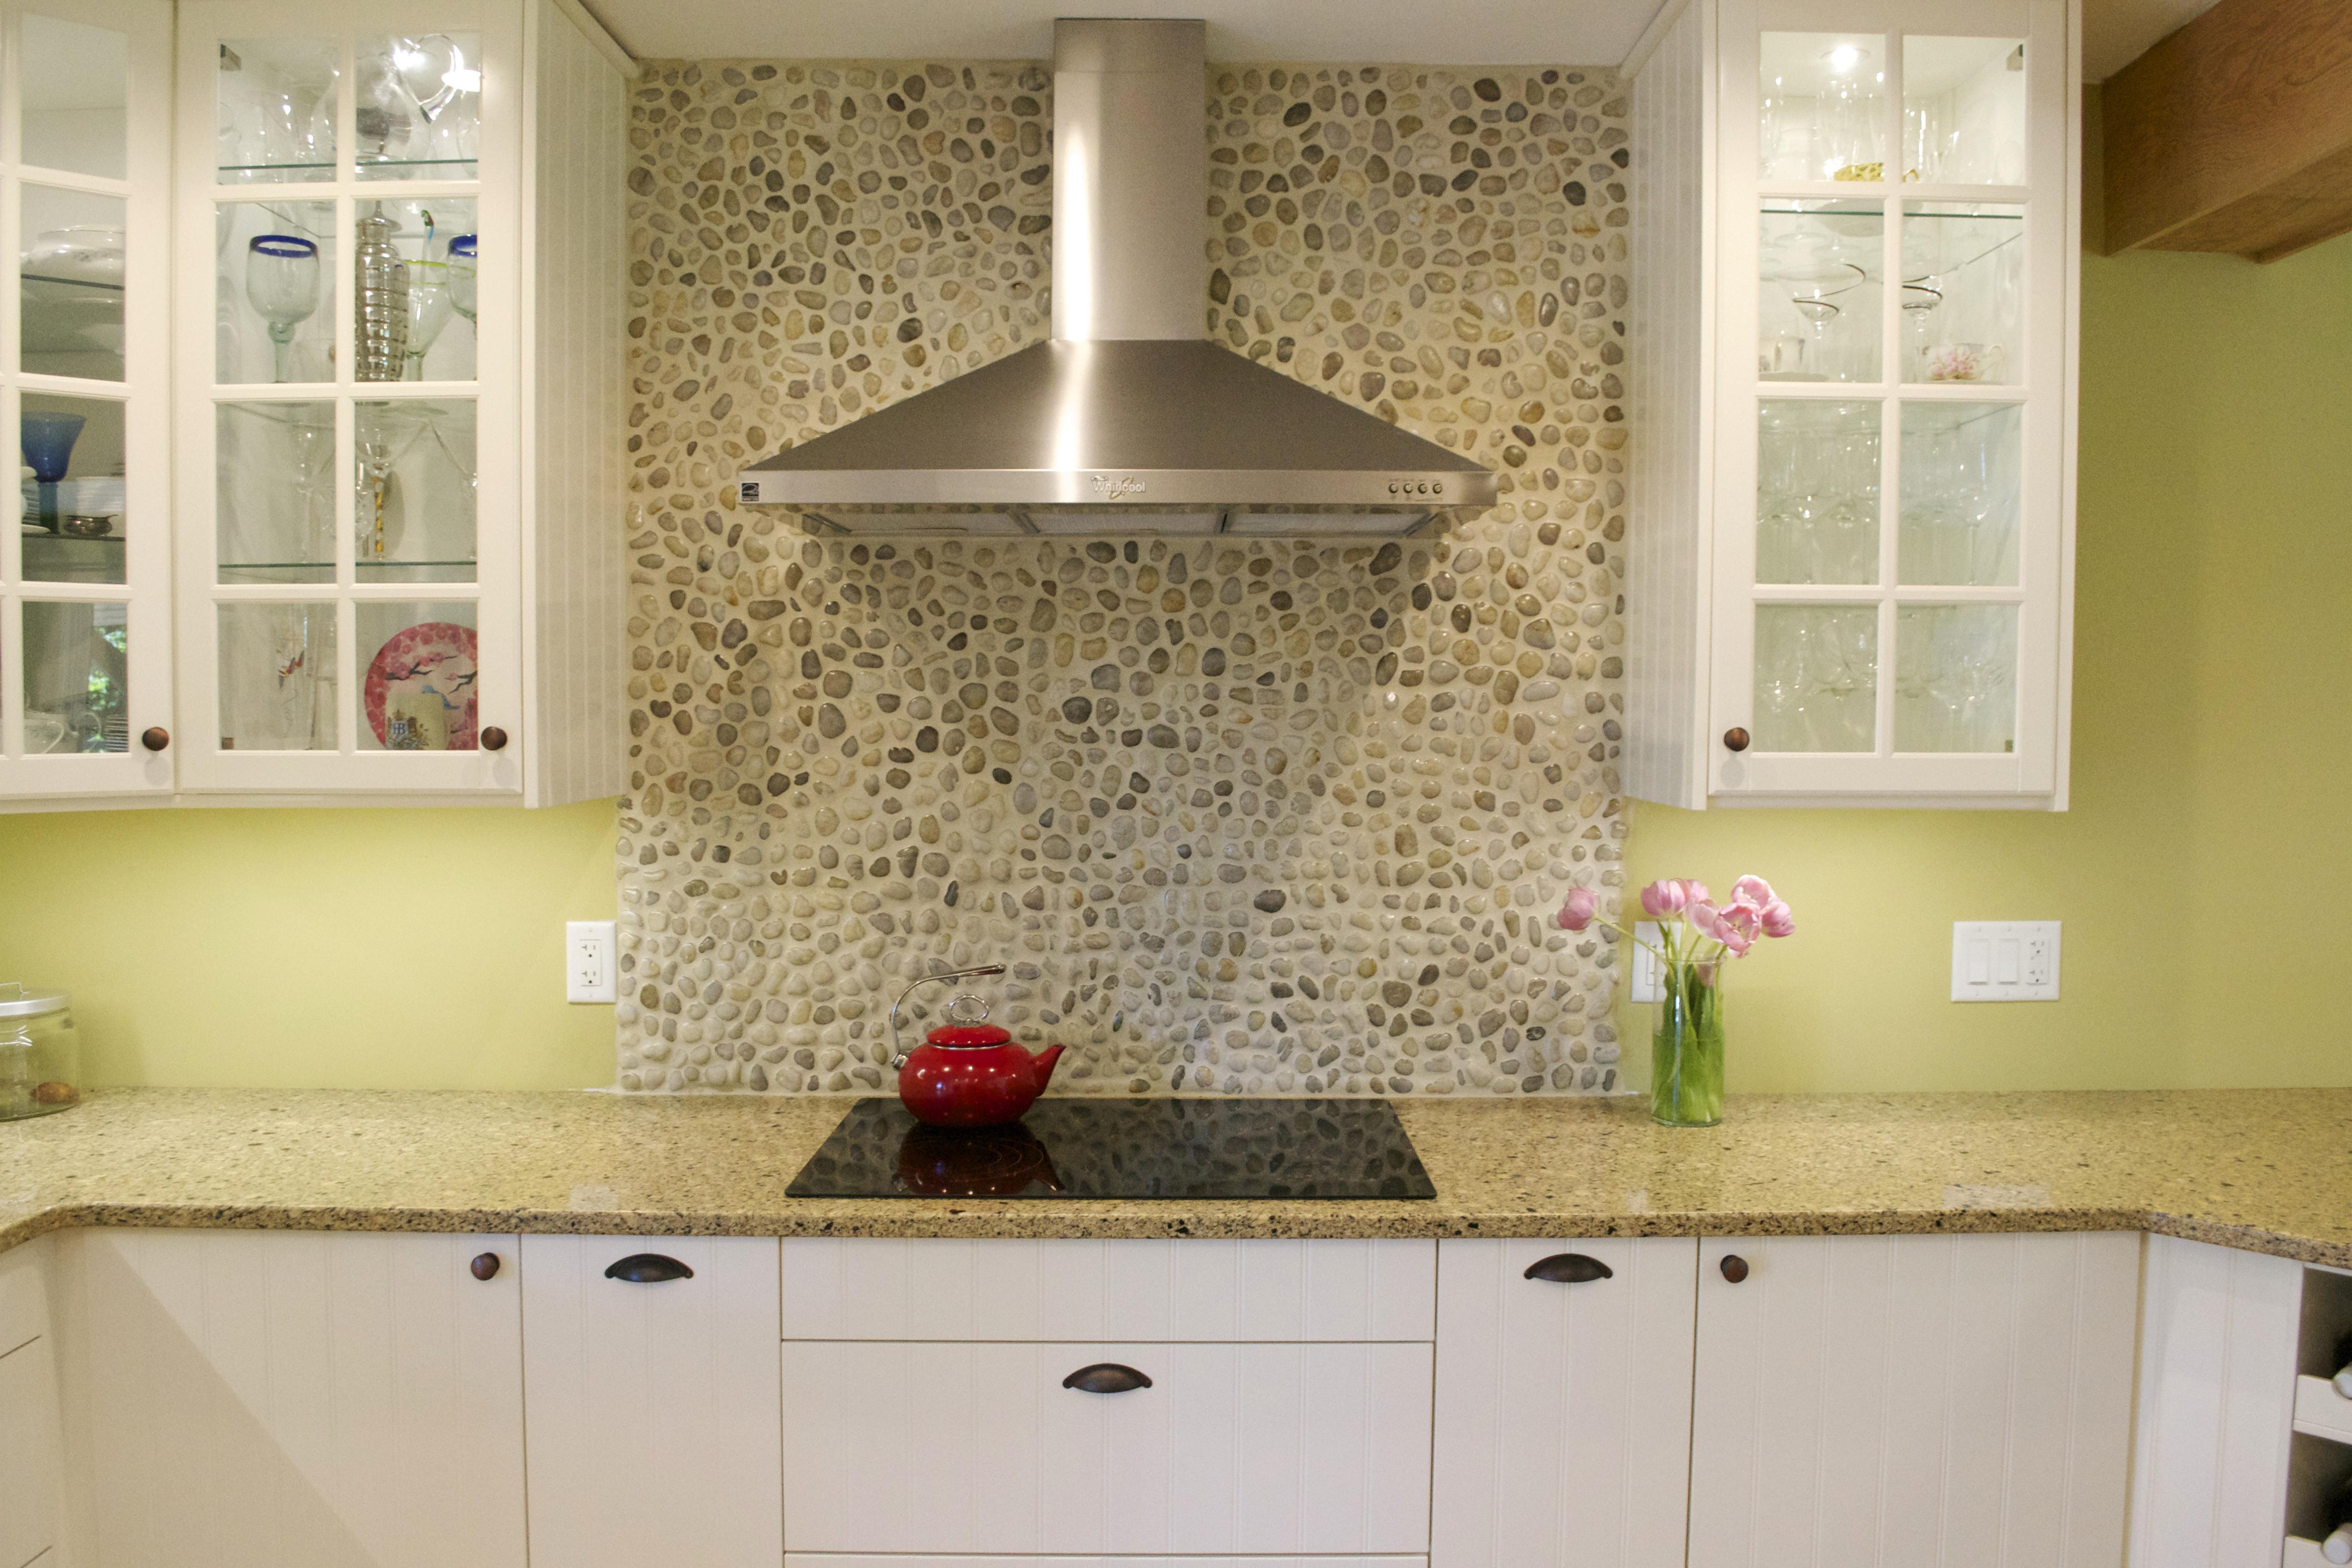 - IKAN Kitchen IKEA Backsplash - Ikan Installations